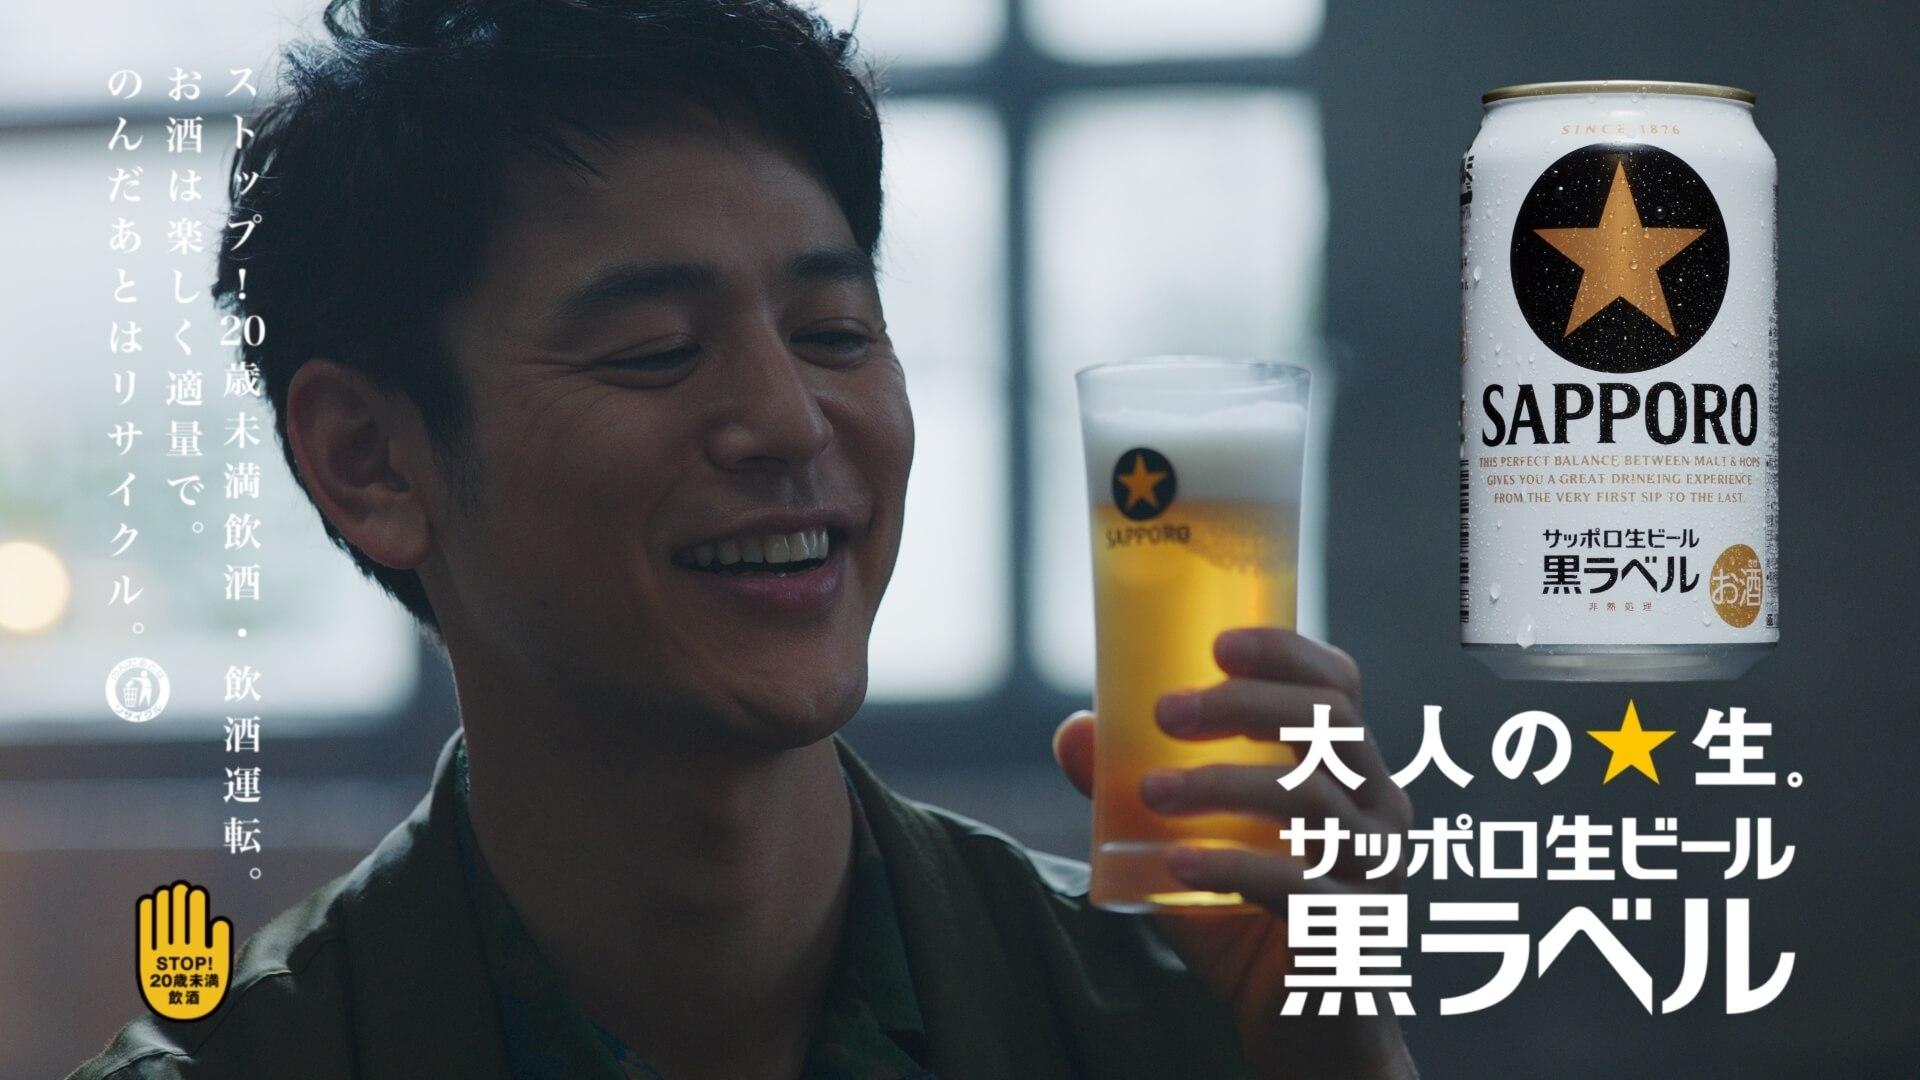 King Gnu常田大希が音楽について語るサッポロビールのCM新バージョンが放映決定!ホームページで特別メッセージムービーも公開 art200707_tsunetadaiki_beer_6